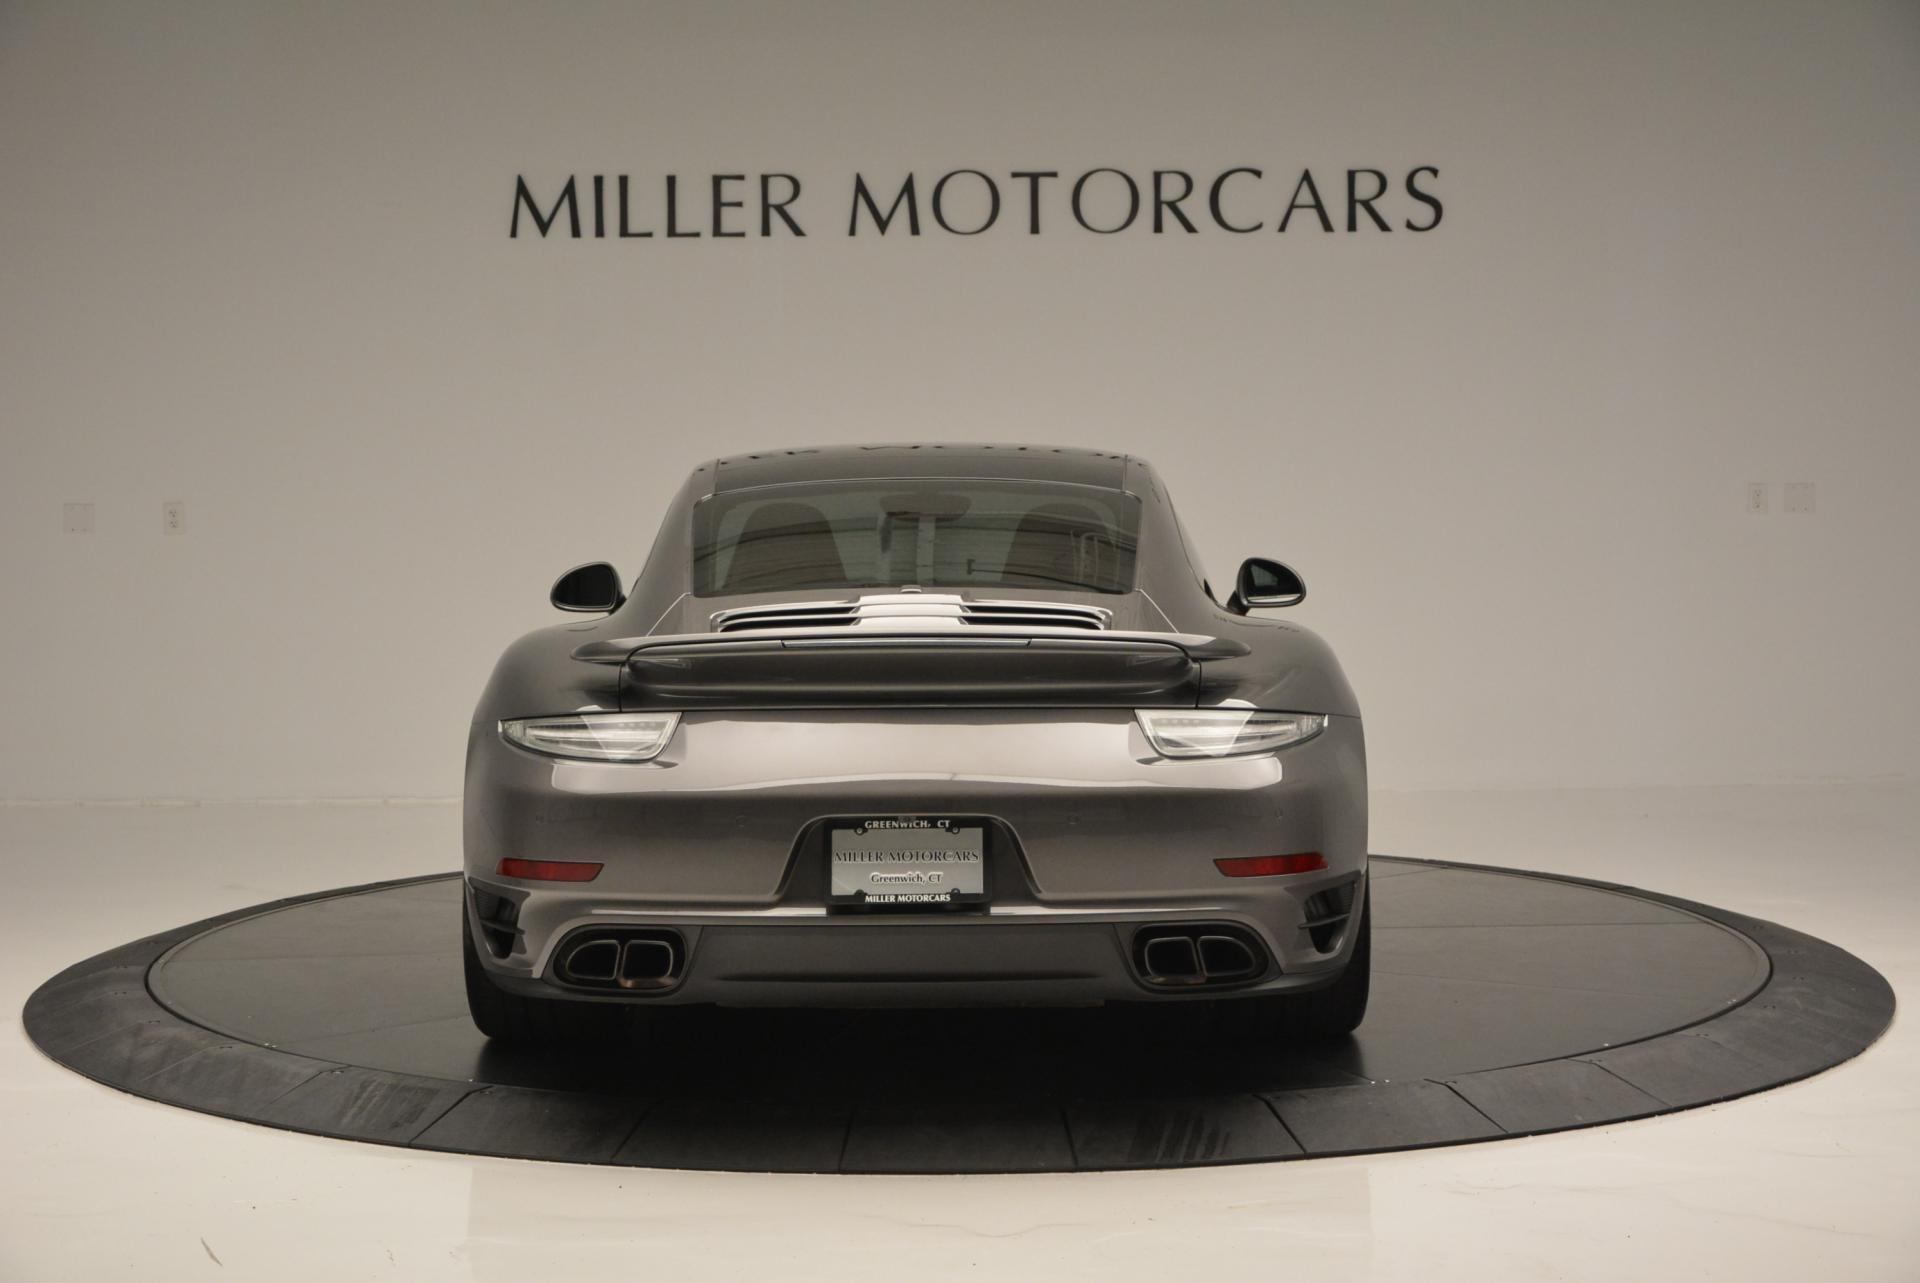 Used 2014 Porsche 911 Turbo S For Sale In Greenwich, CT 113_p5